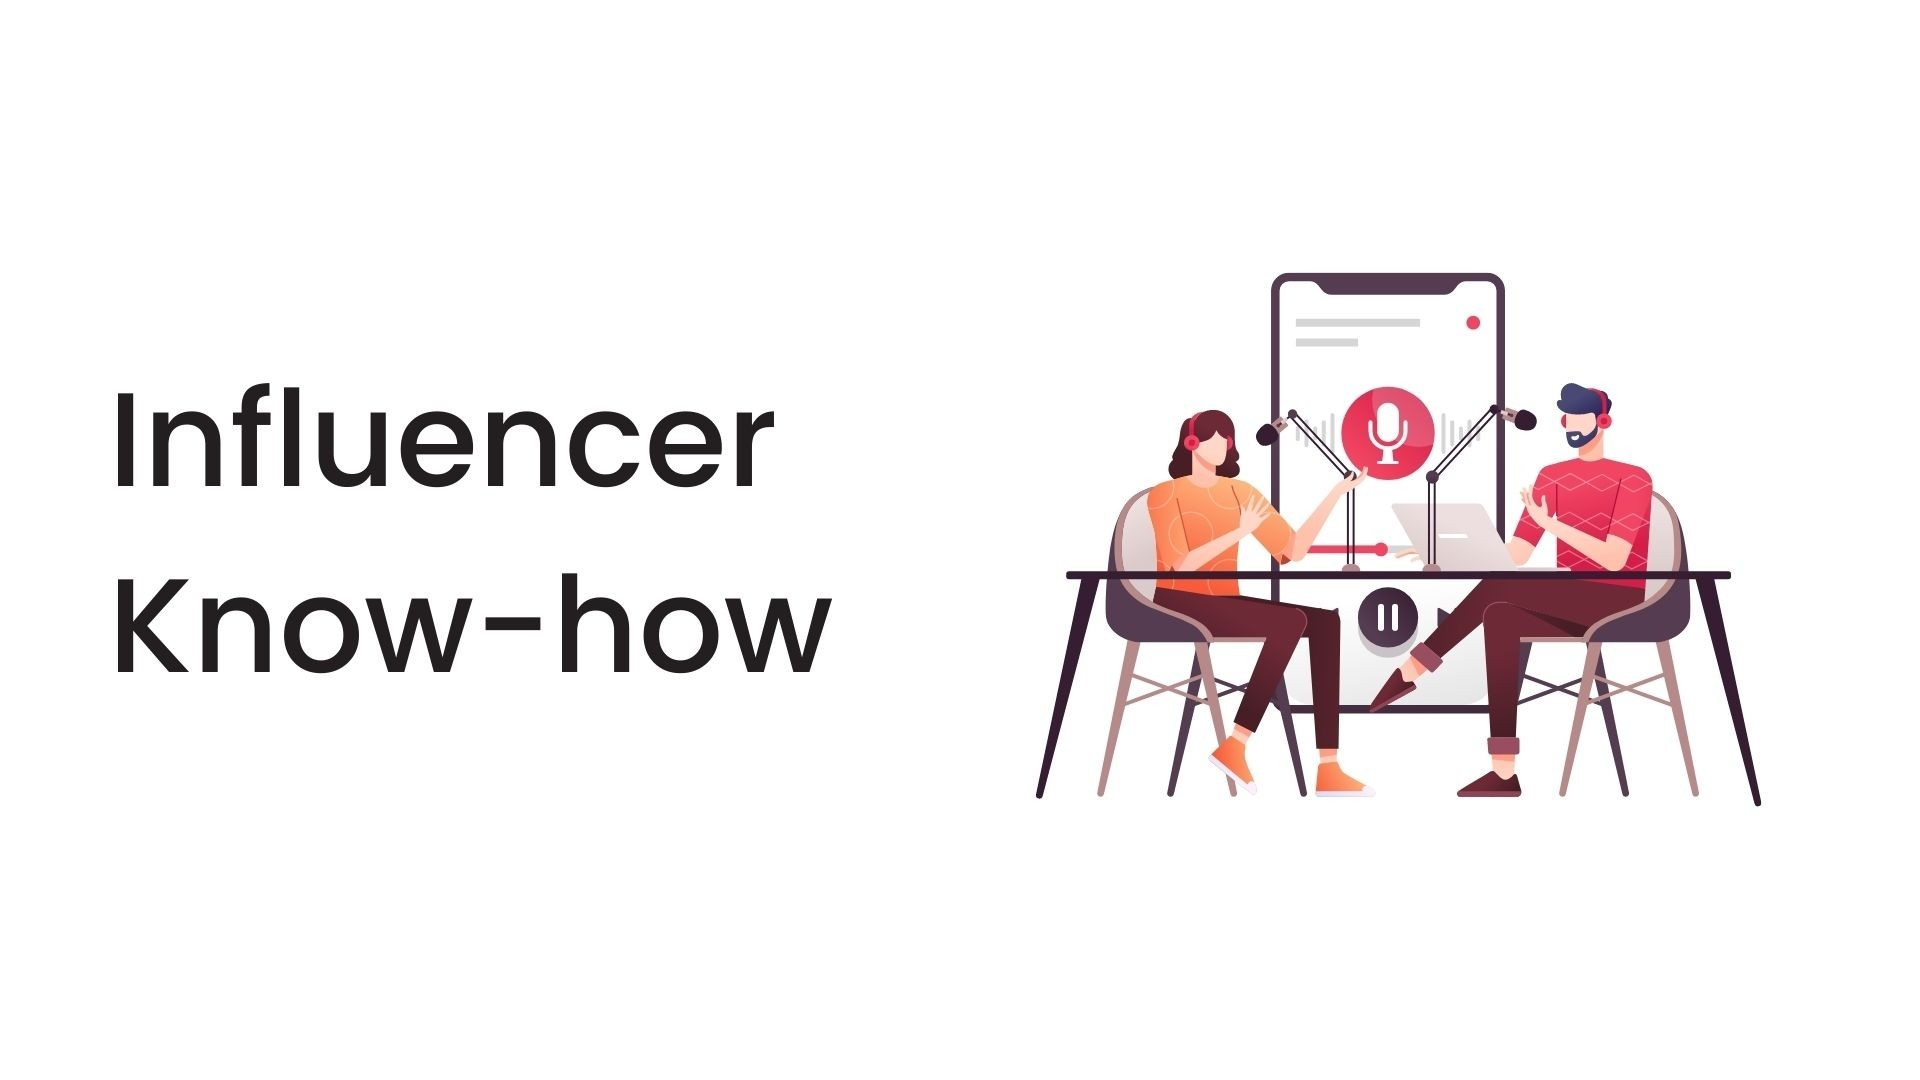 Digital_Coach_Academy_Personal_Branding_Architect_Influencer